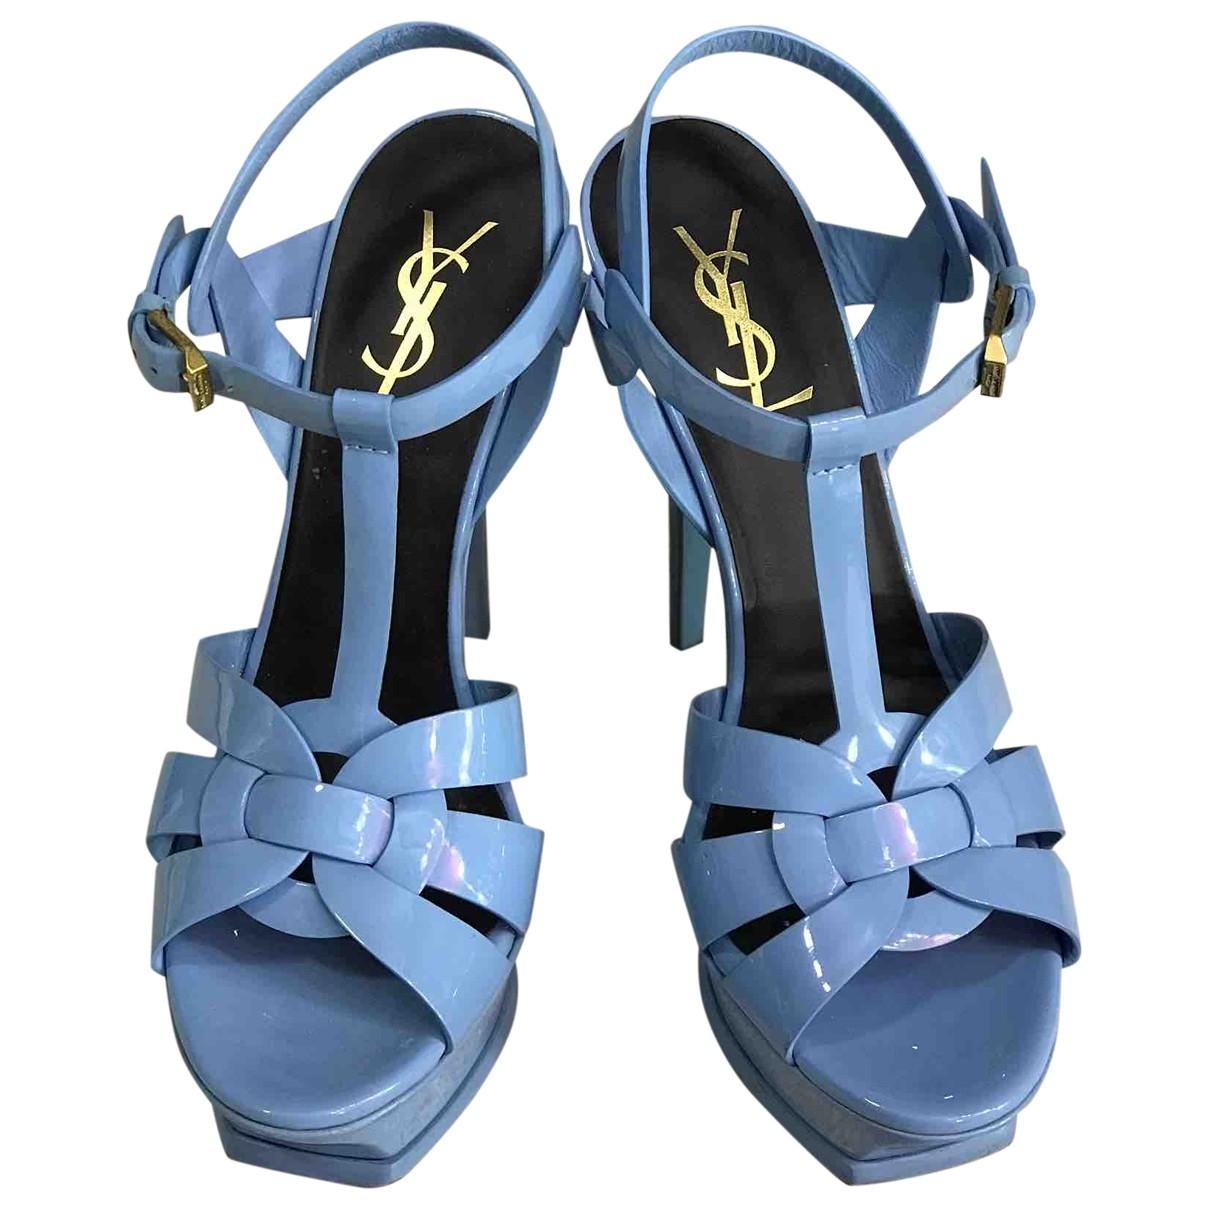 Saint Laurent Tribute Turquoise Patent leather Sandals for Women 37.5 EU